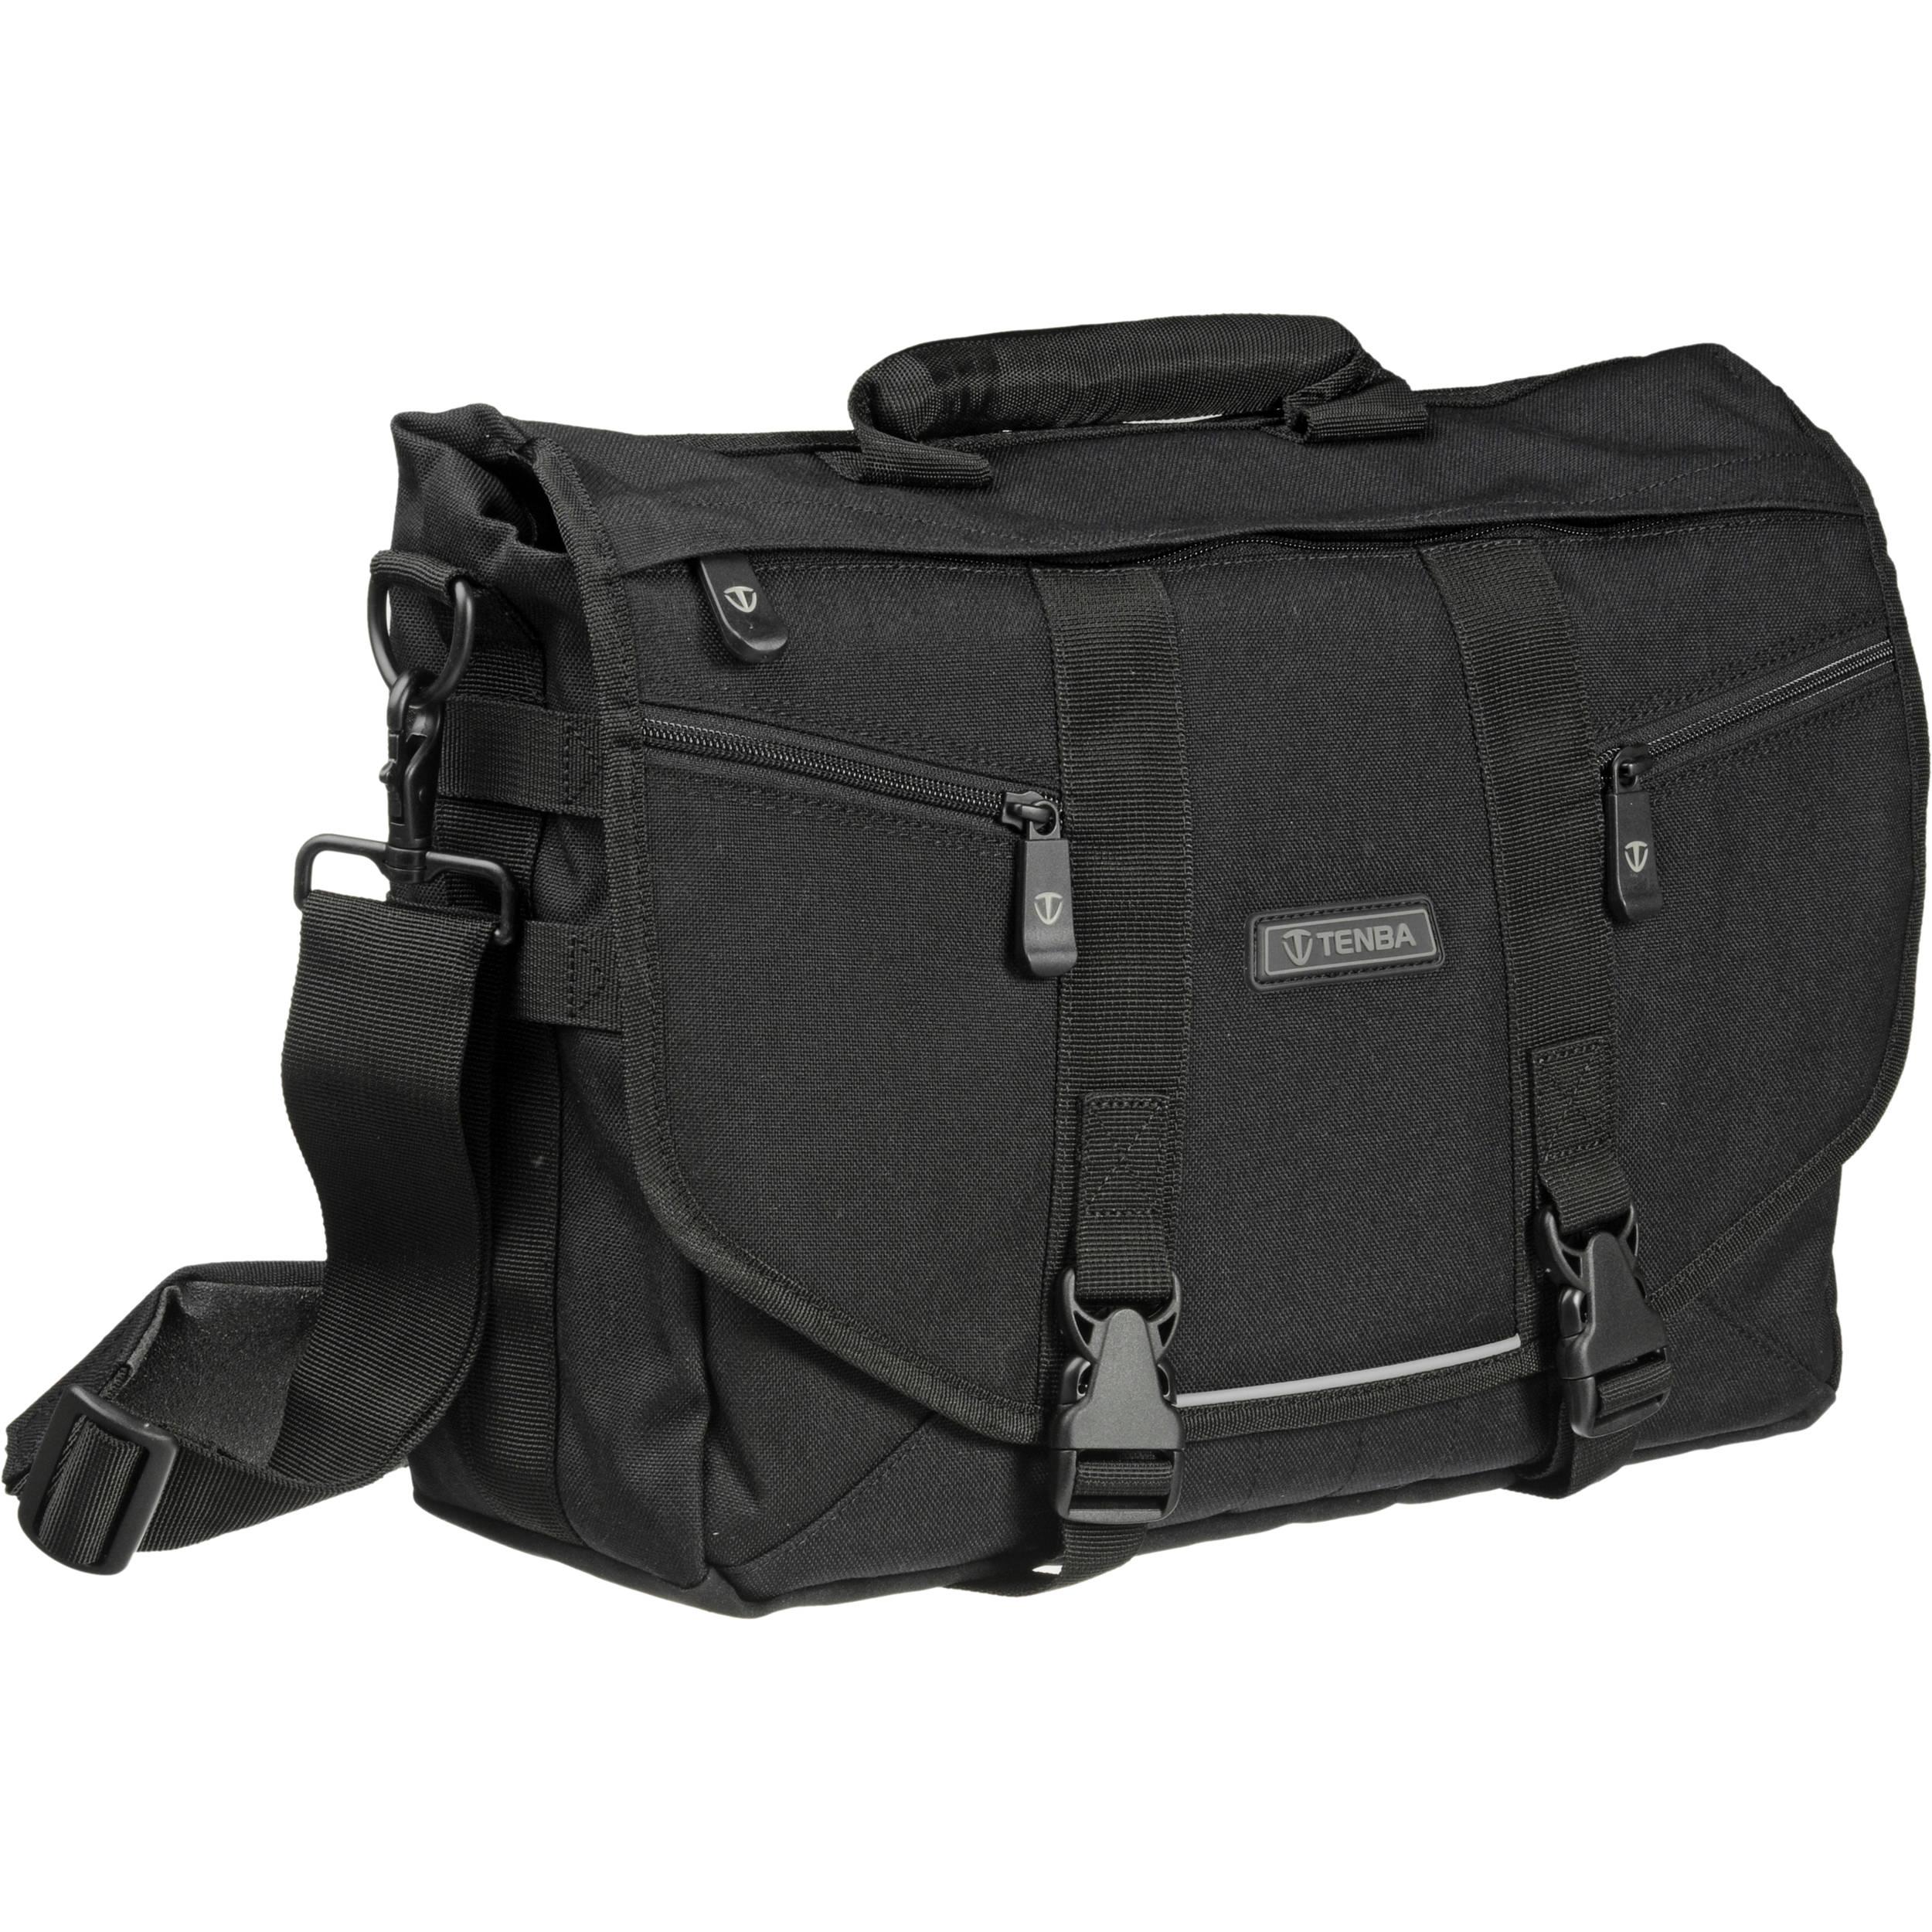 Tenba Messenger: Small Photo/Laptop Bag (Black) 638-221 B&H